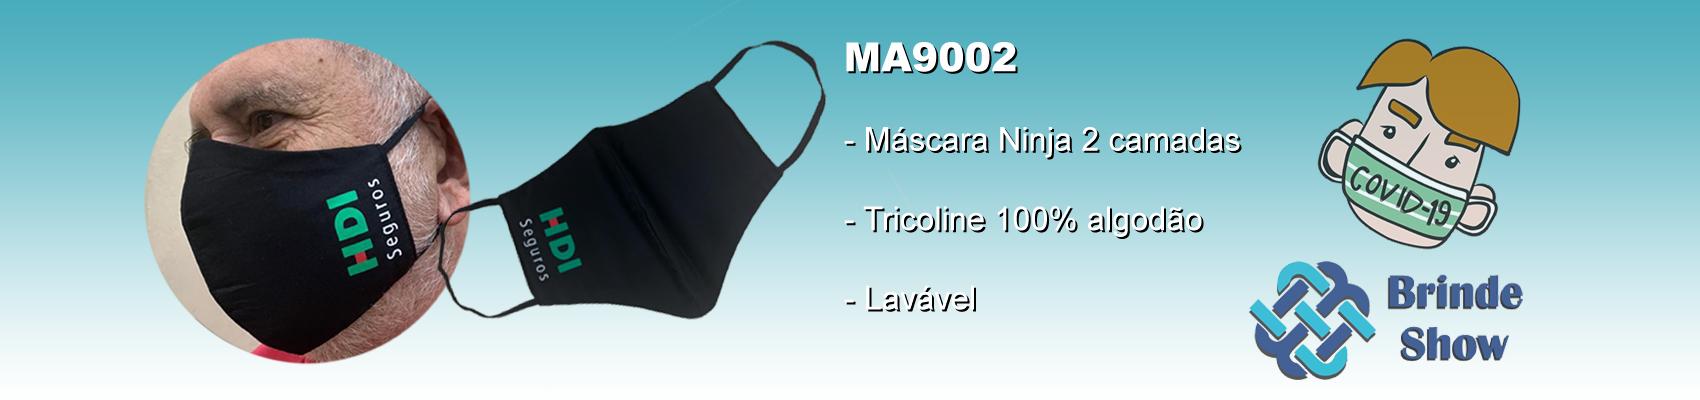 MA9002